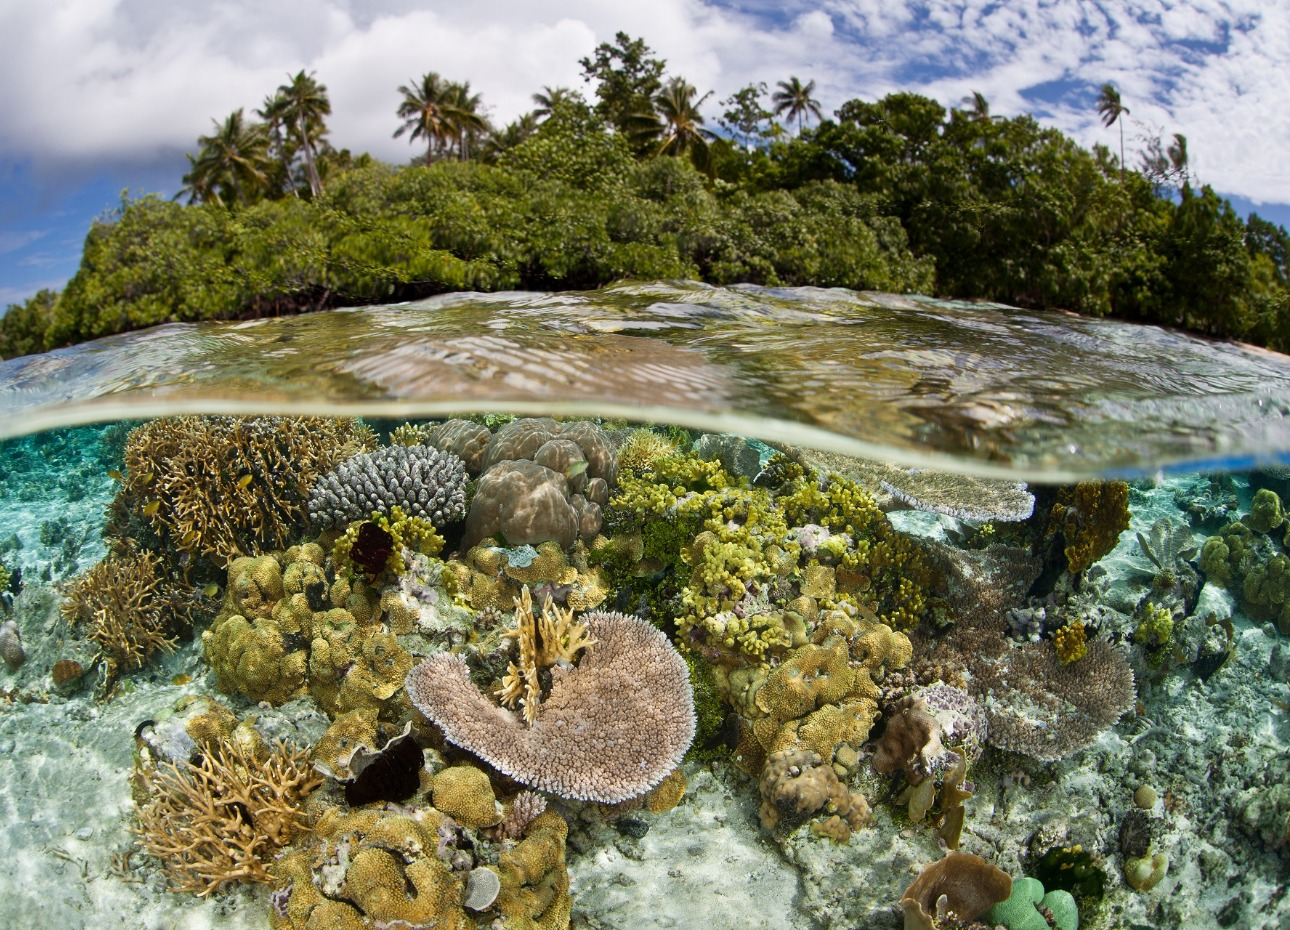 Solomon Islands, Underwater, Coral, image